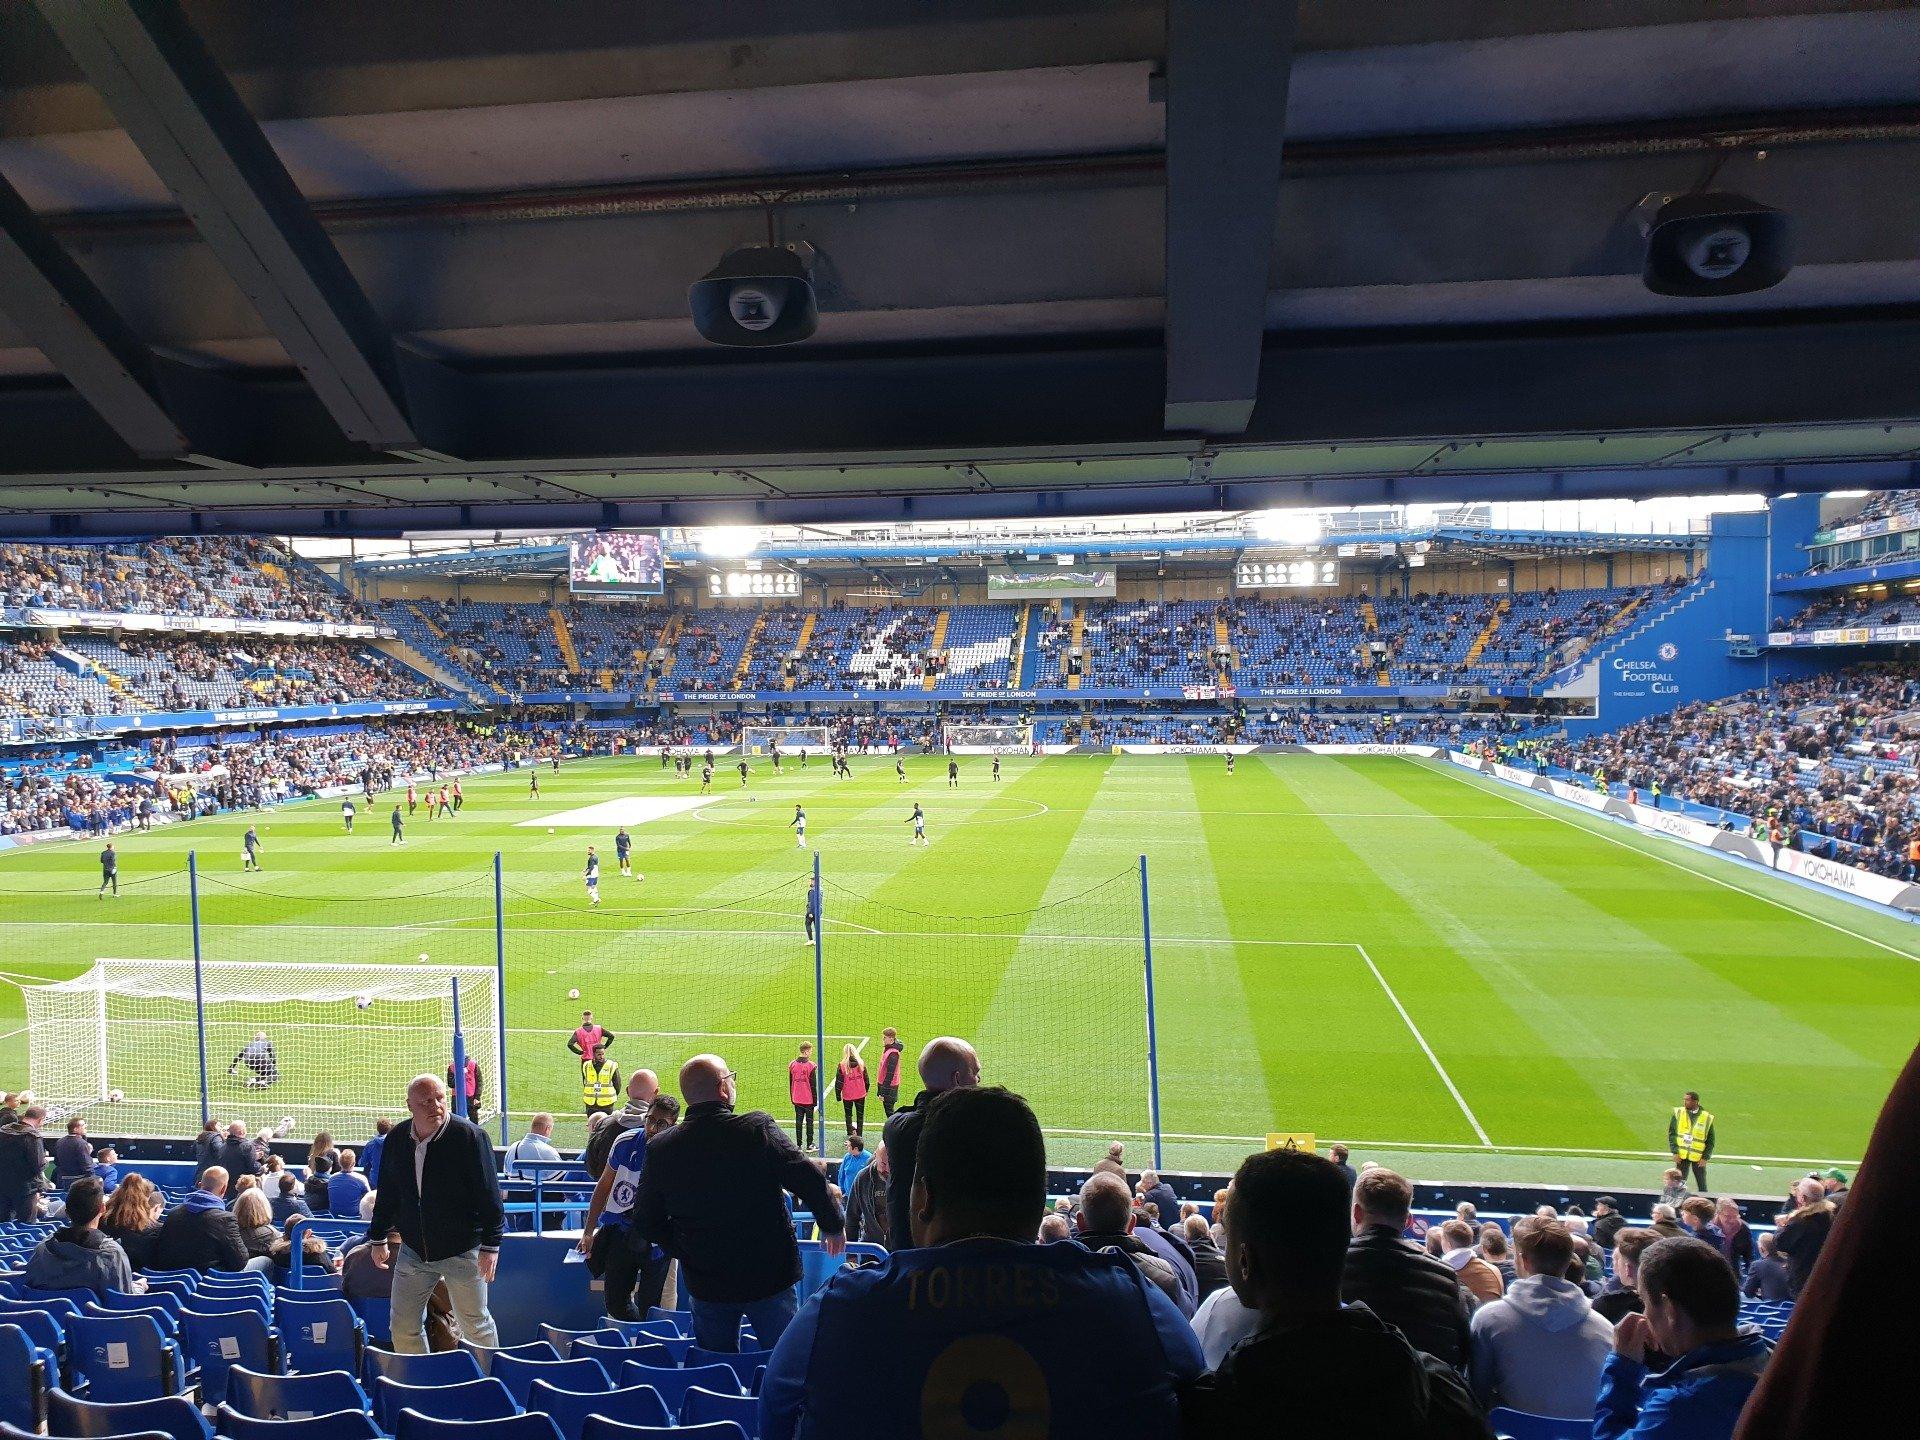 Stamford Bridge Section Matthew Harding Lower 11 Row EE Seat 47